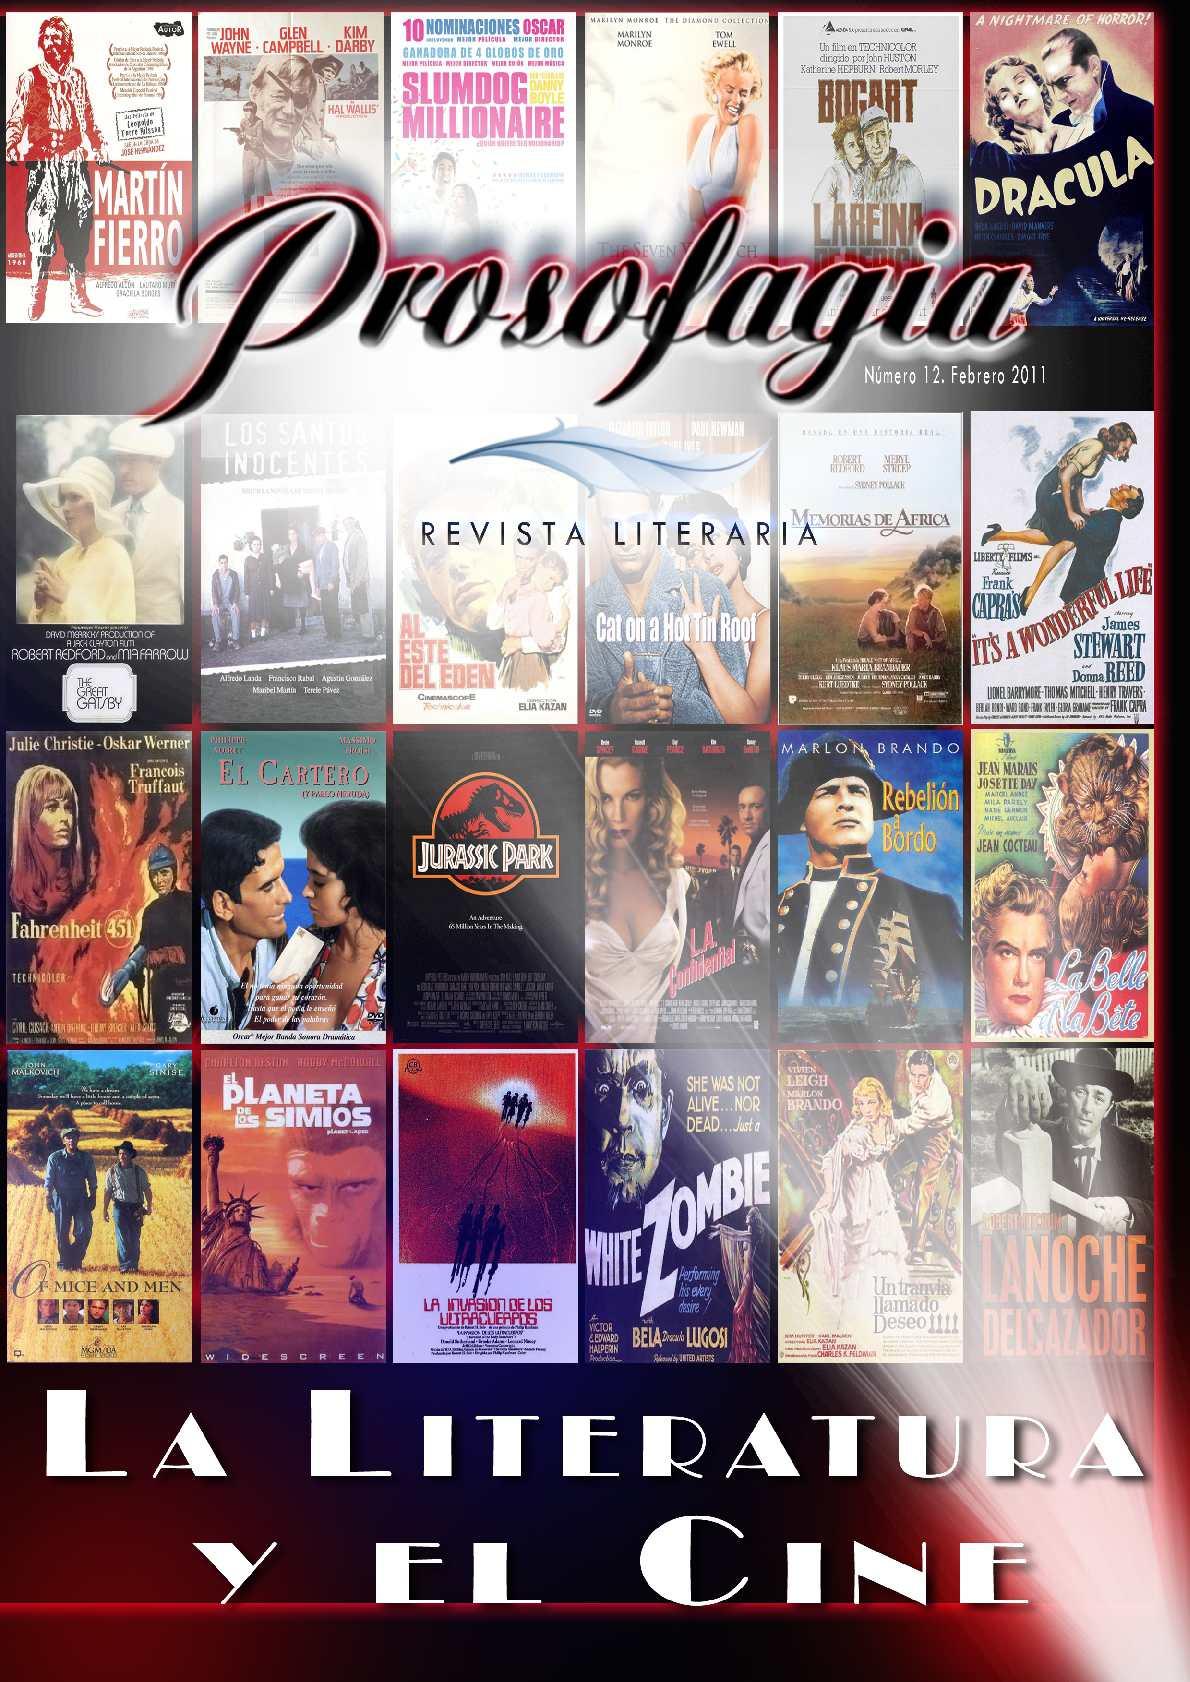 Revista Literaria Prosofagia Nº 12 - Febrero 2011